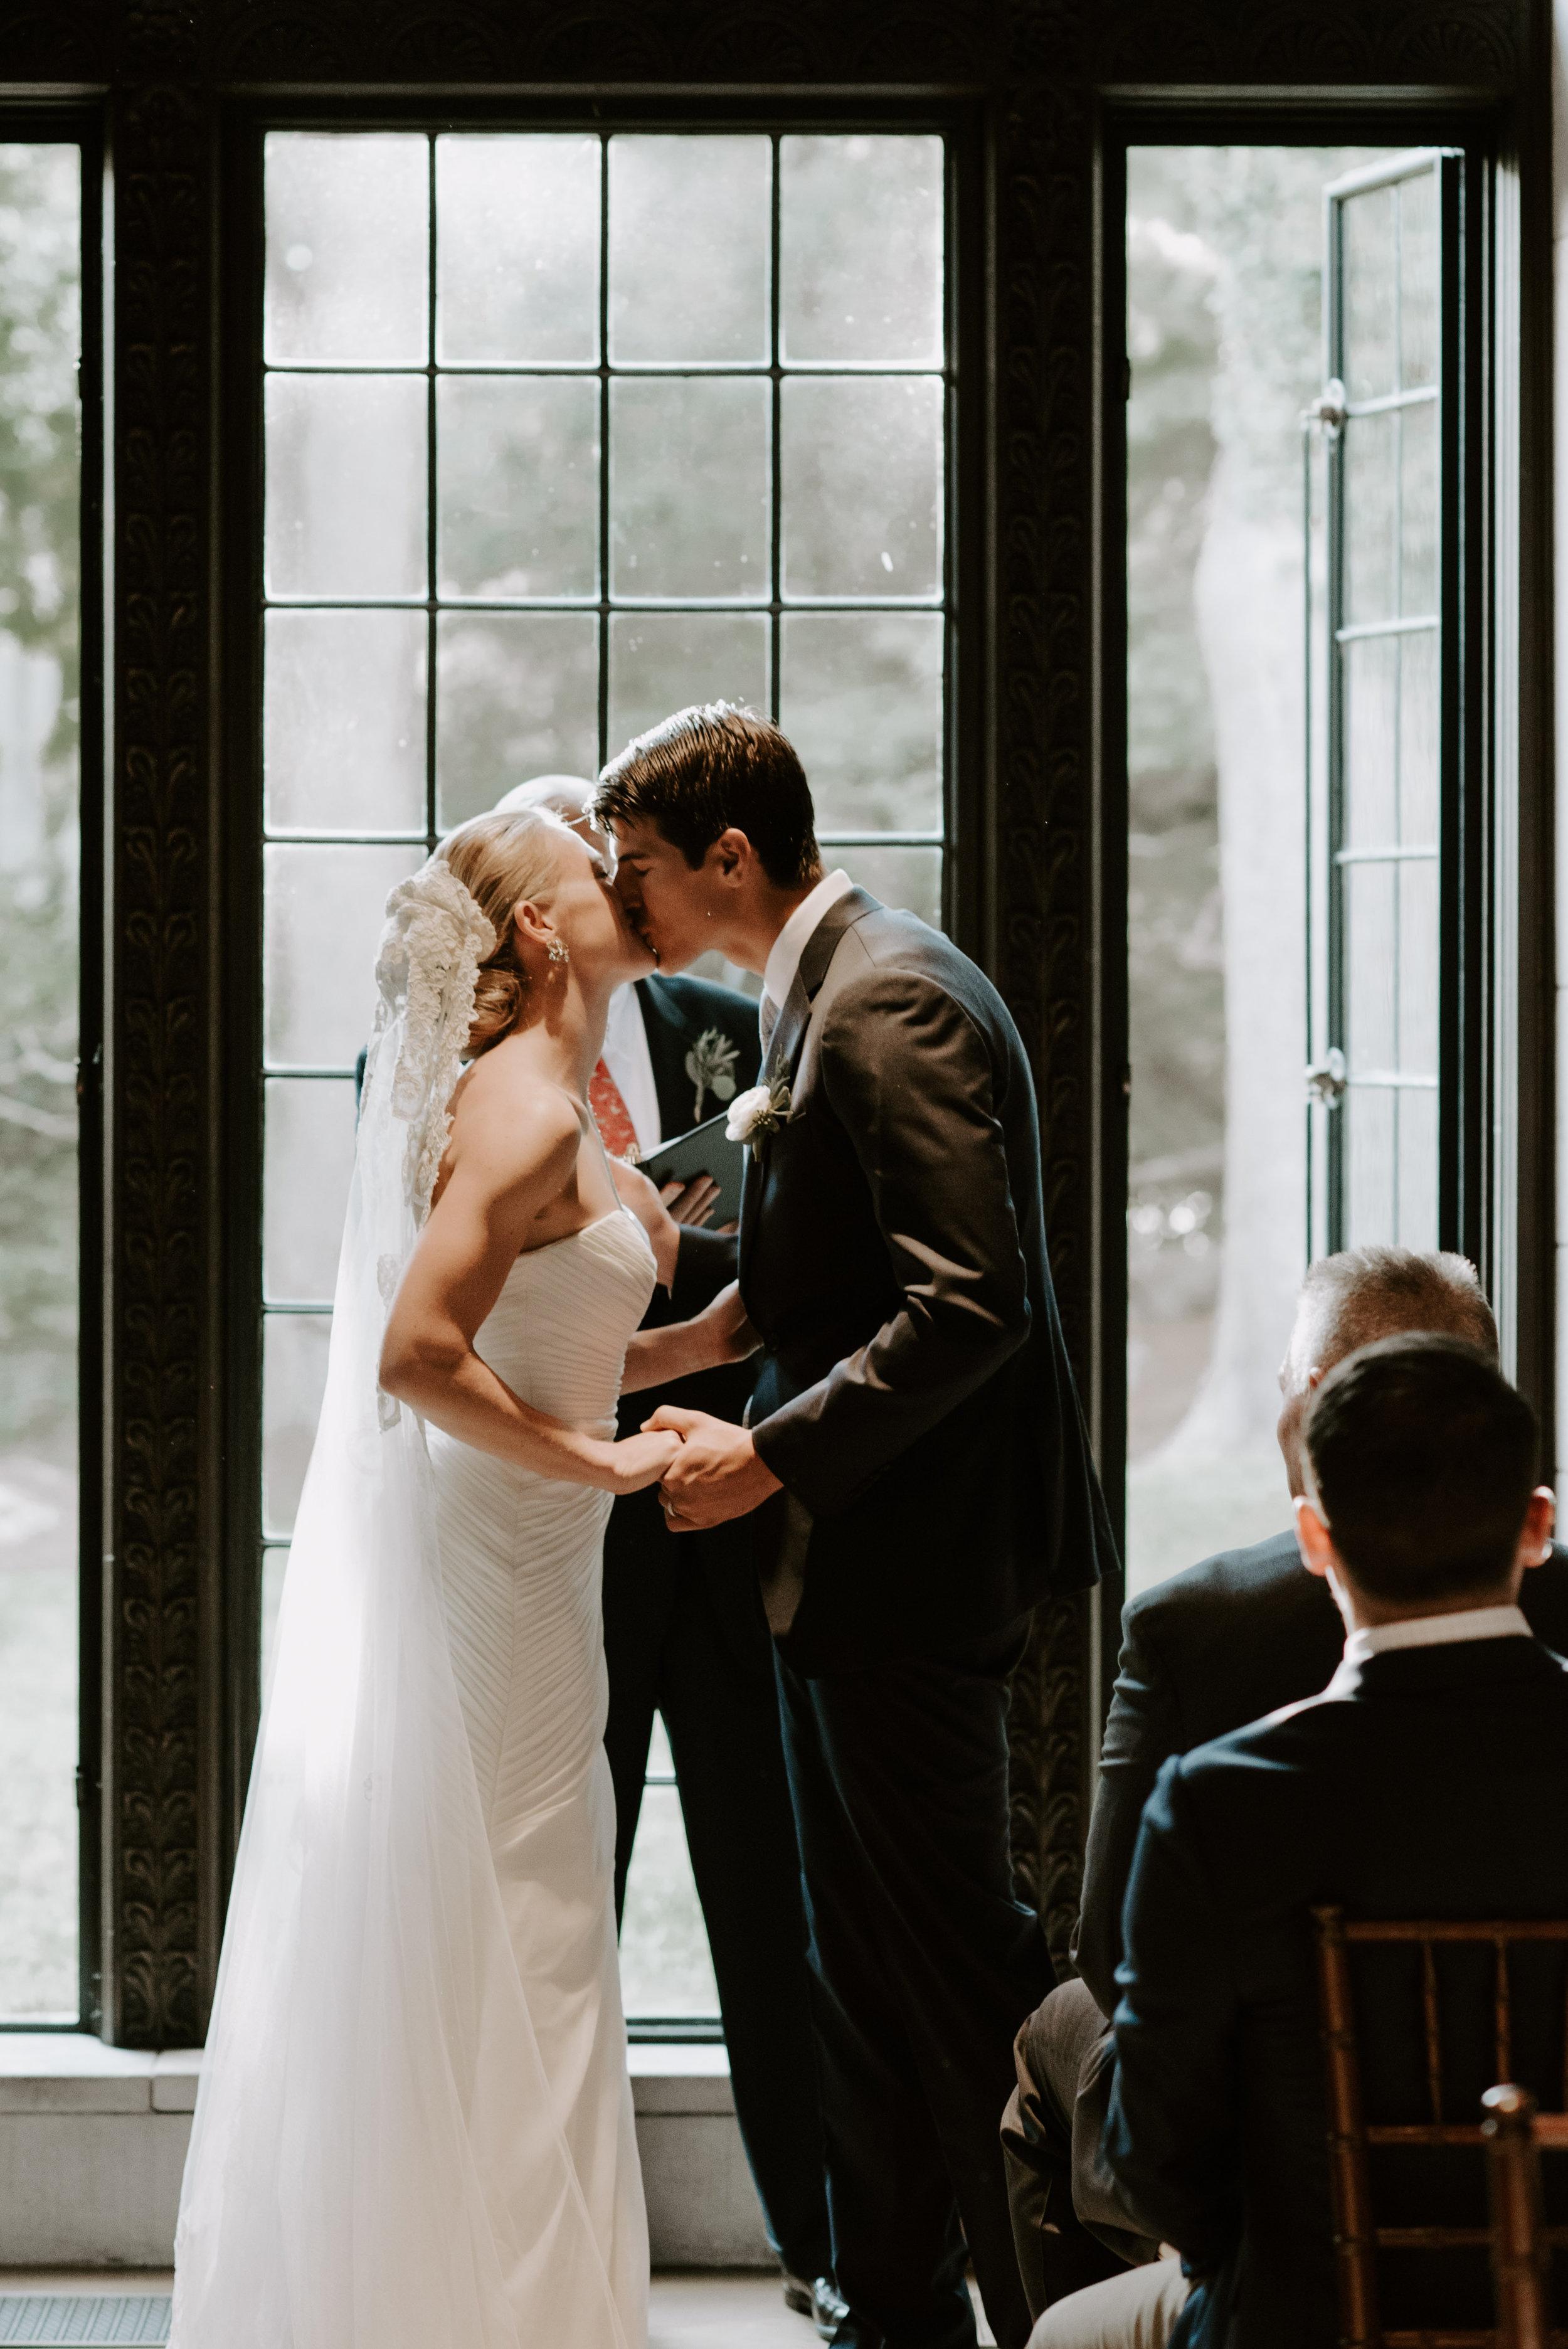 Moody Intimate Library Wedding | Boston Wedding Photographer | Madeline Rose Photography Co.